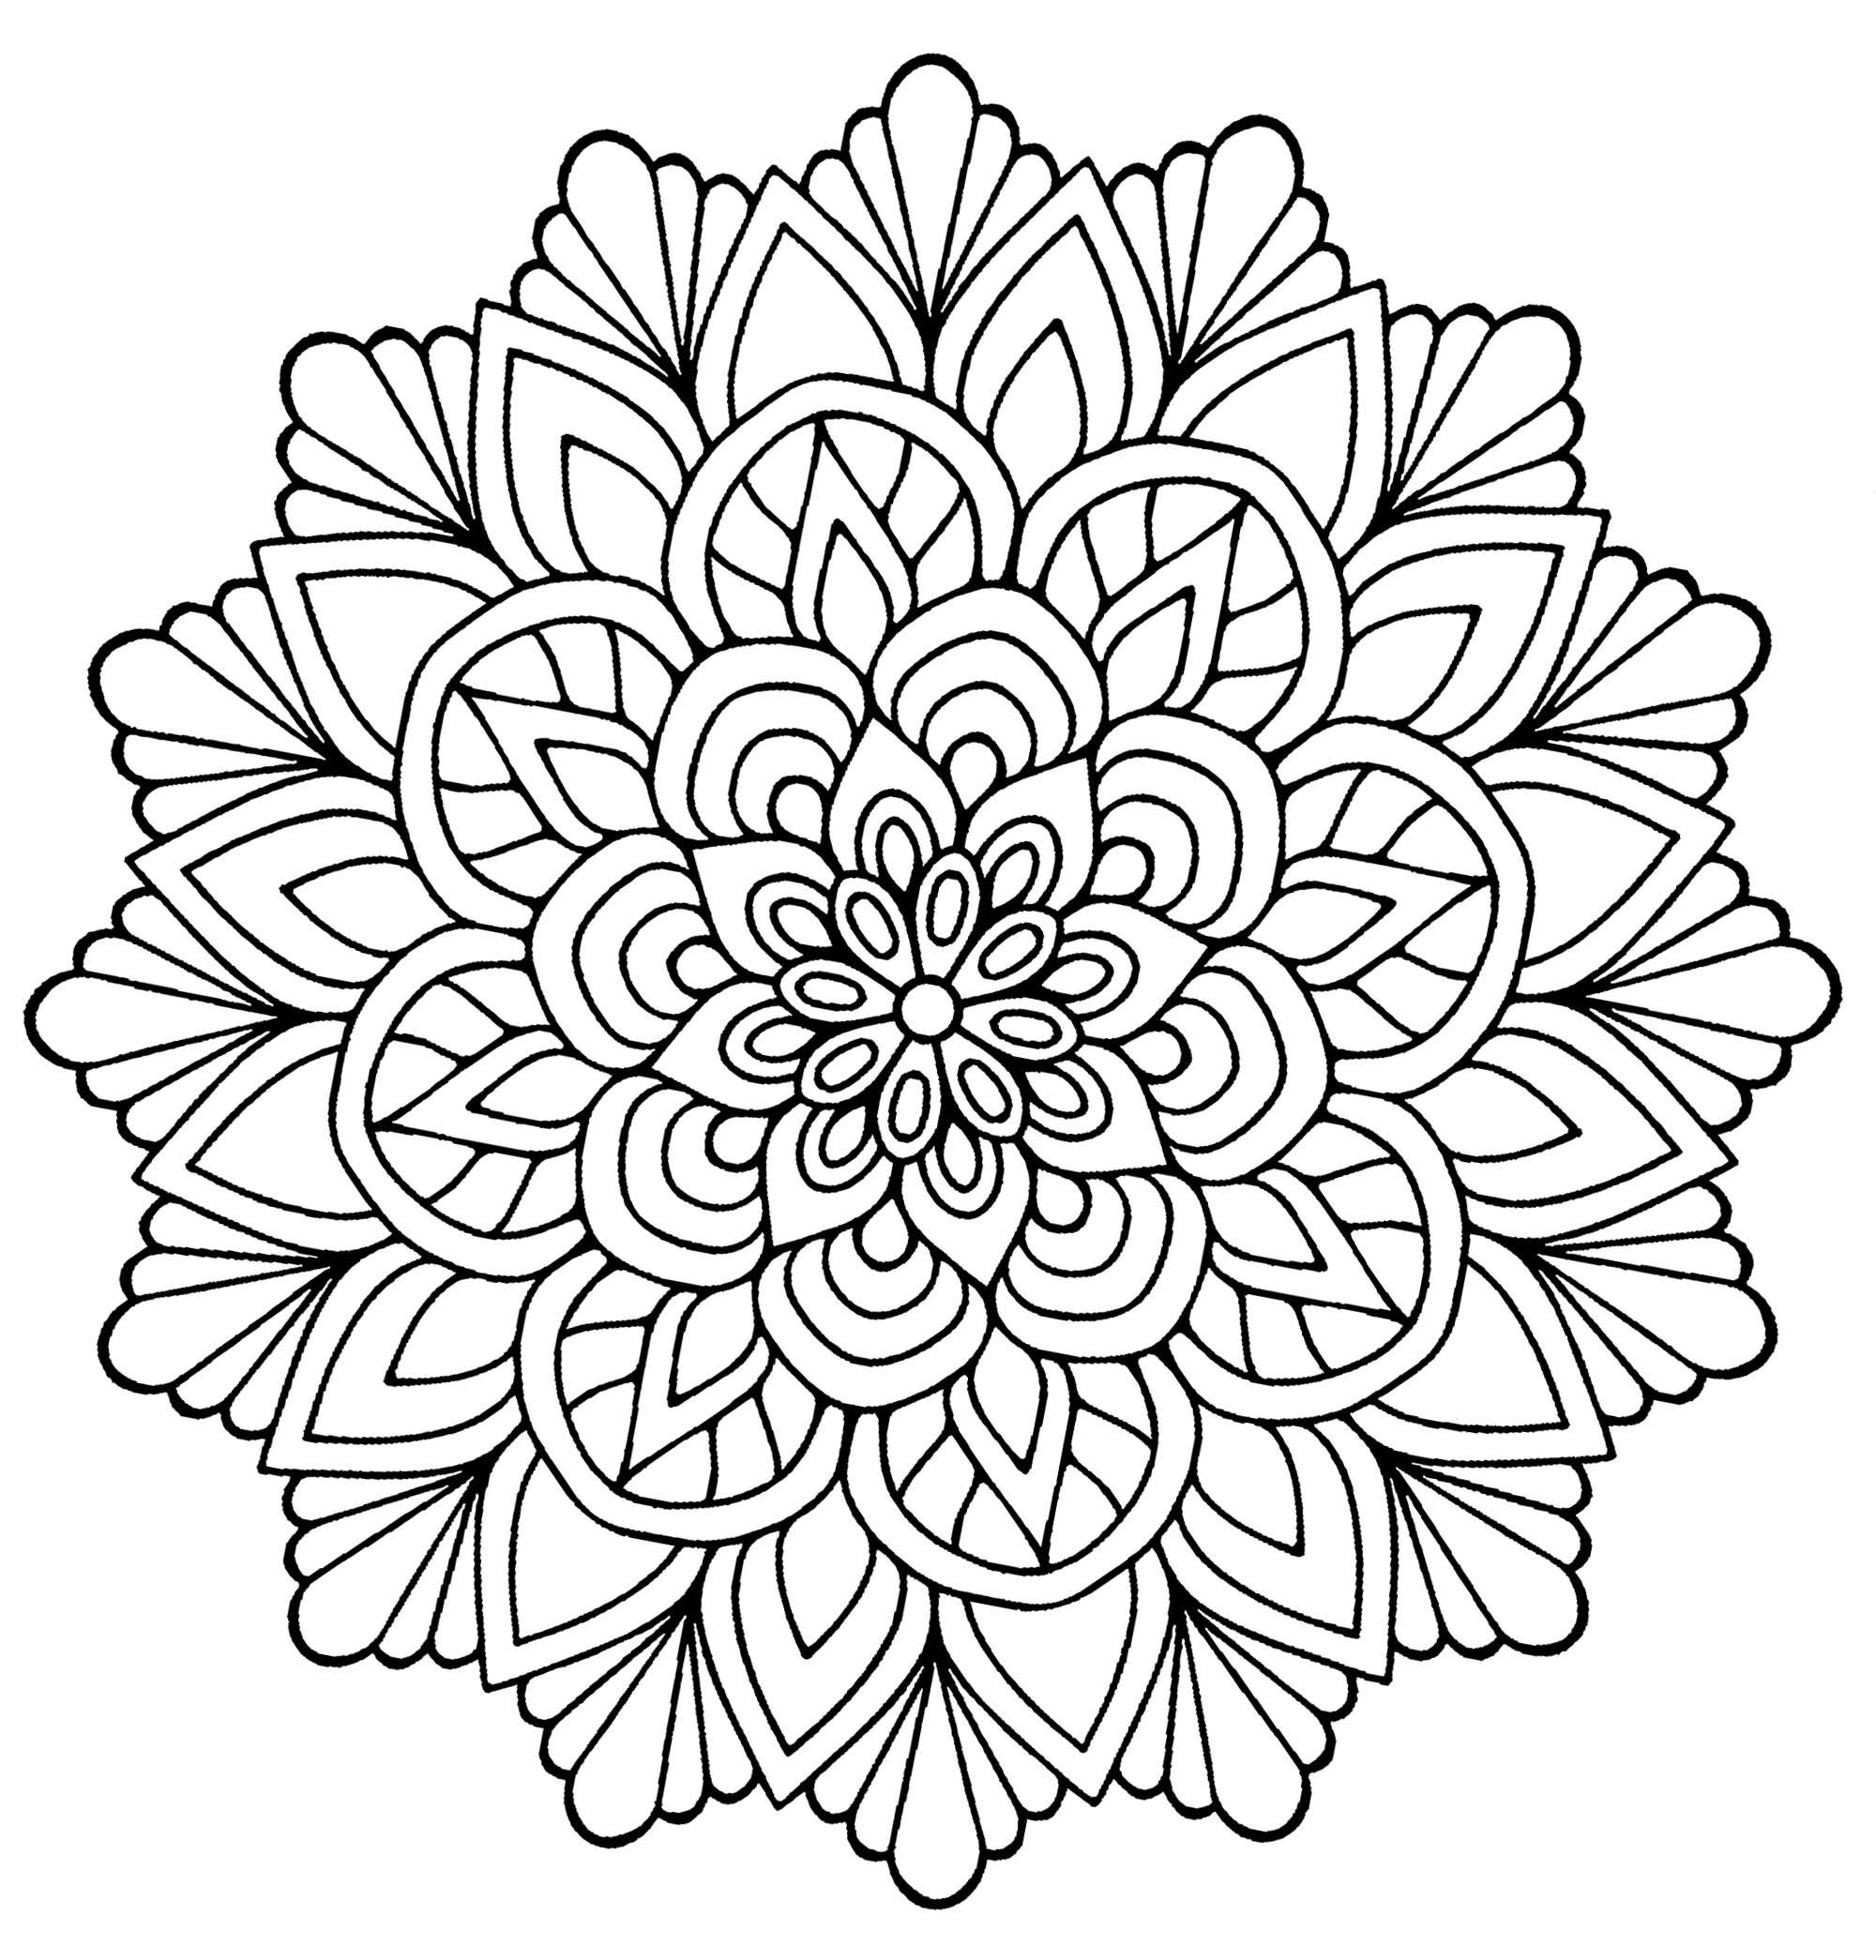 2000x2090 Mandala Flower With Leaves Mandalas